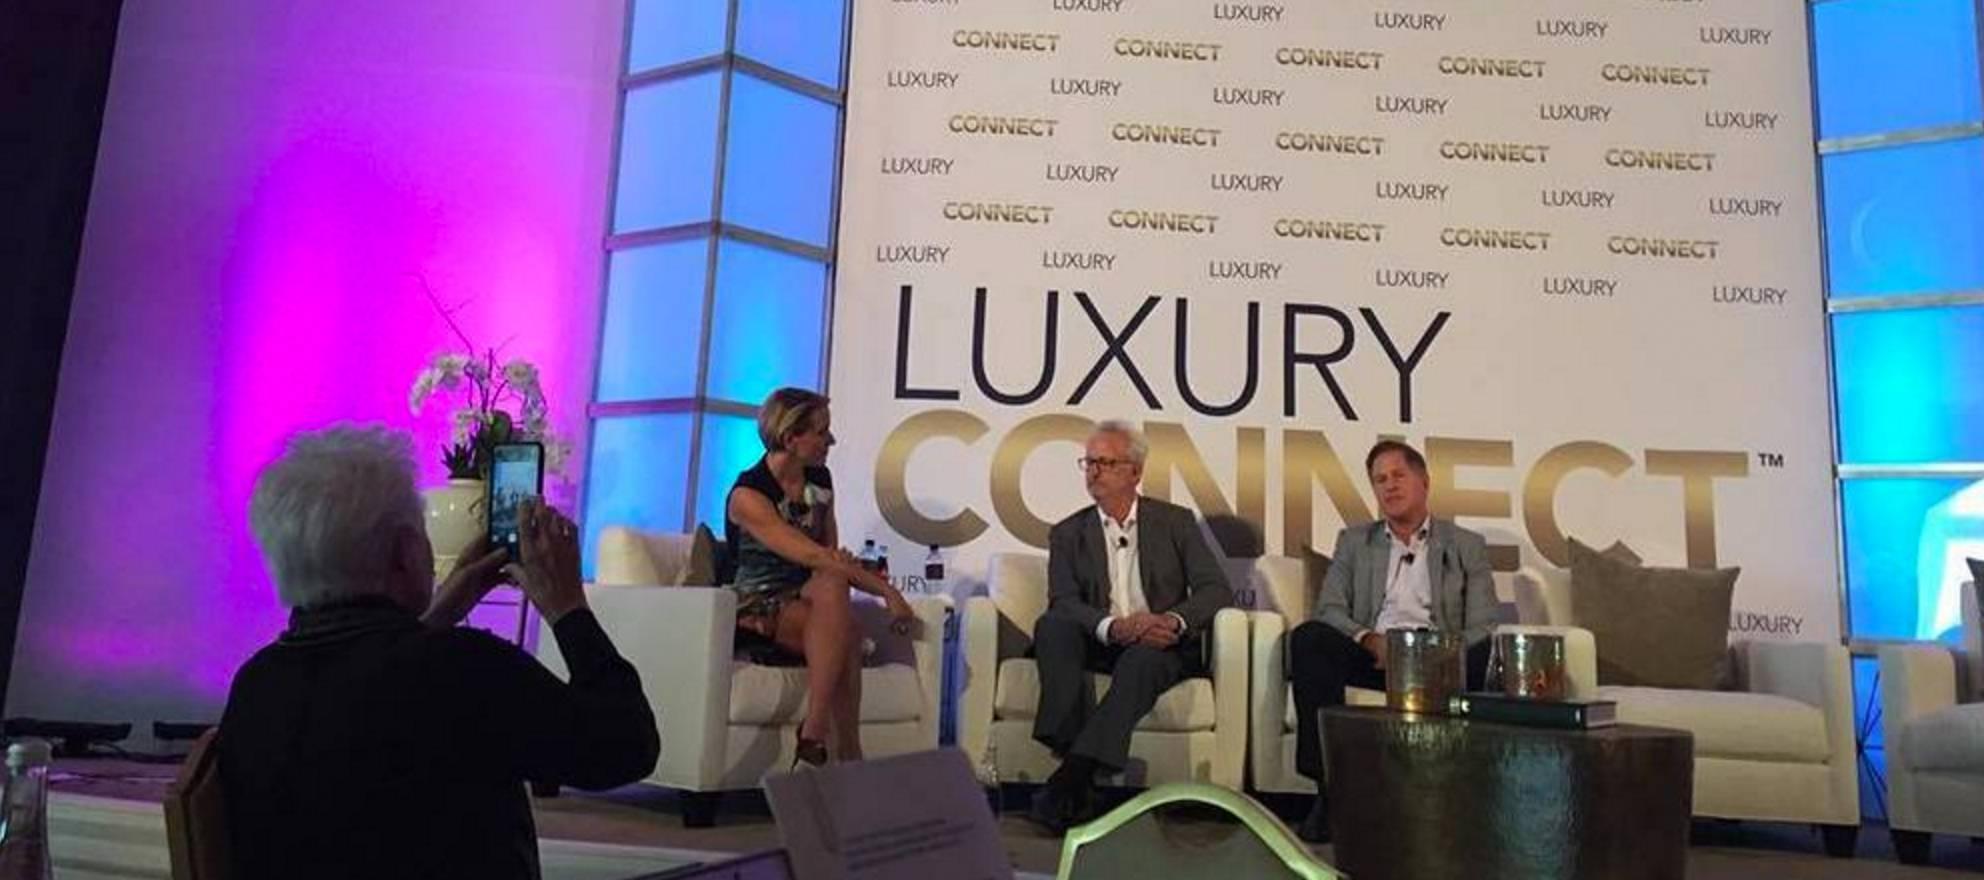 3 takeaways from last week's Inman Luxury Connect